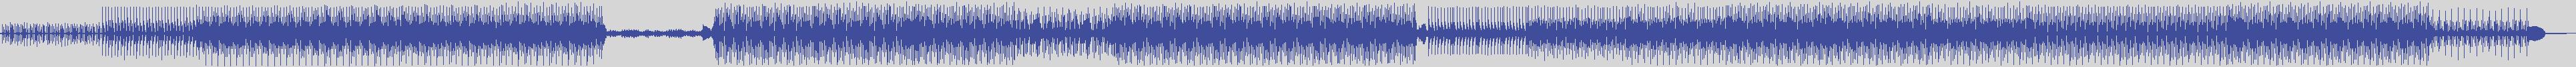 just_digital_records [JS1406] Sugar Freak - Music Change My Life [Great Exuma Dub] audio wave form